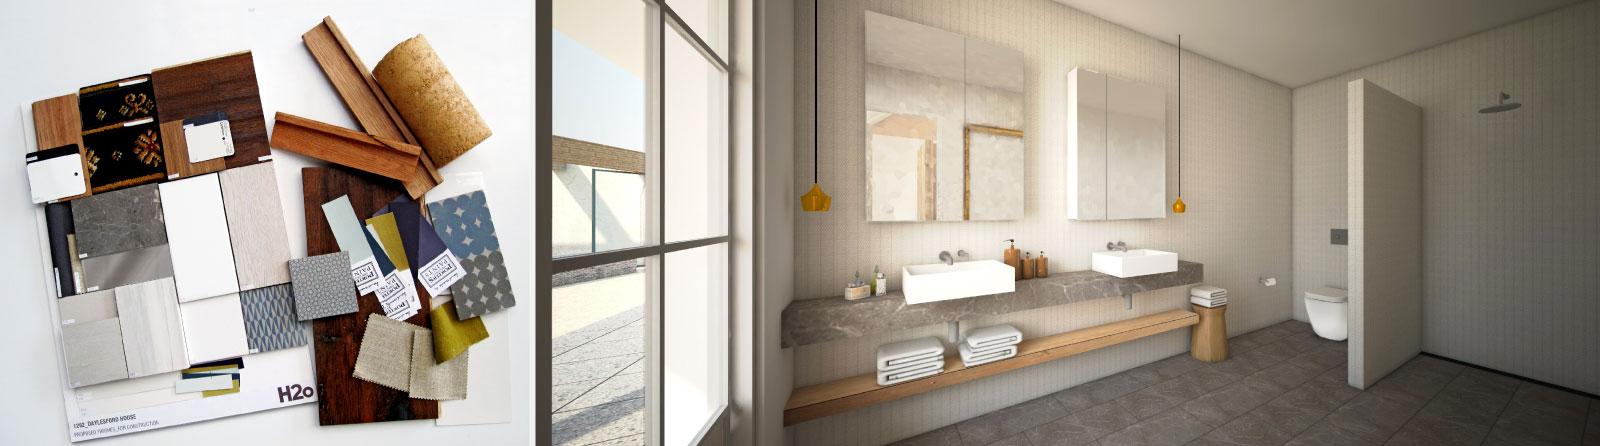 H2o-Architects-Melbourne-Ballarat-House-04